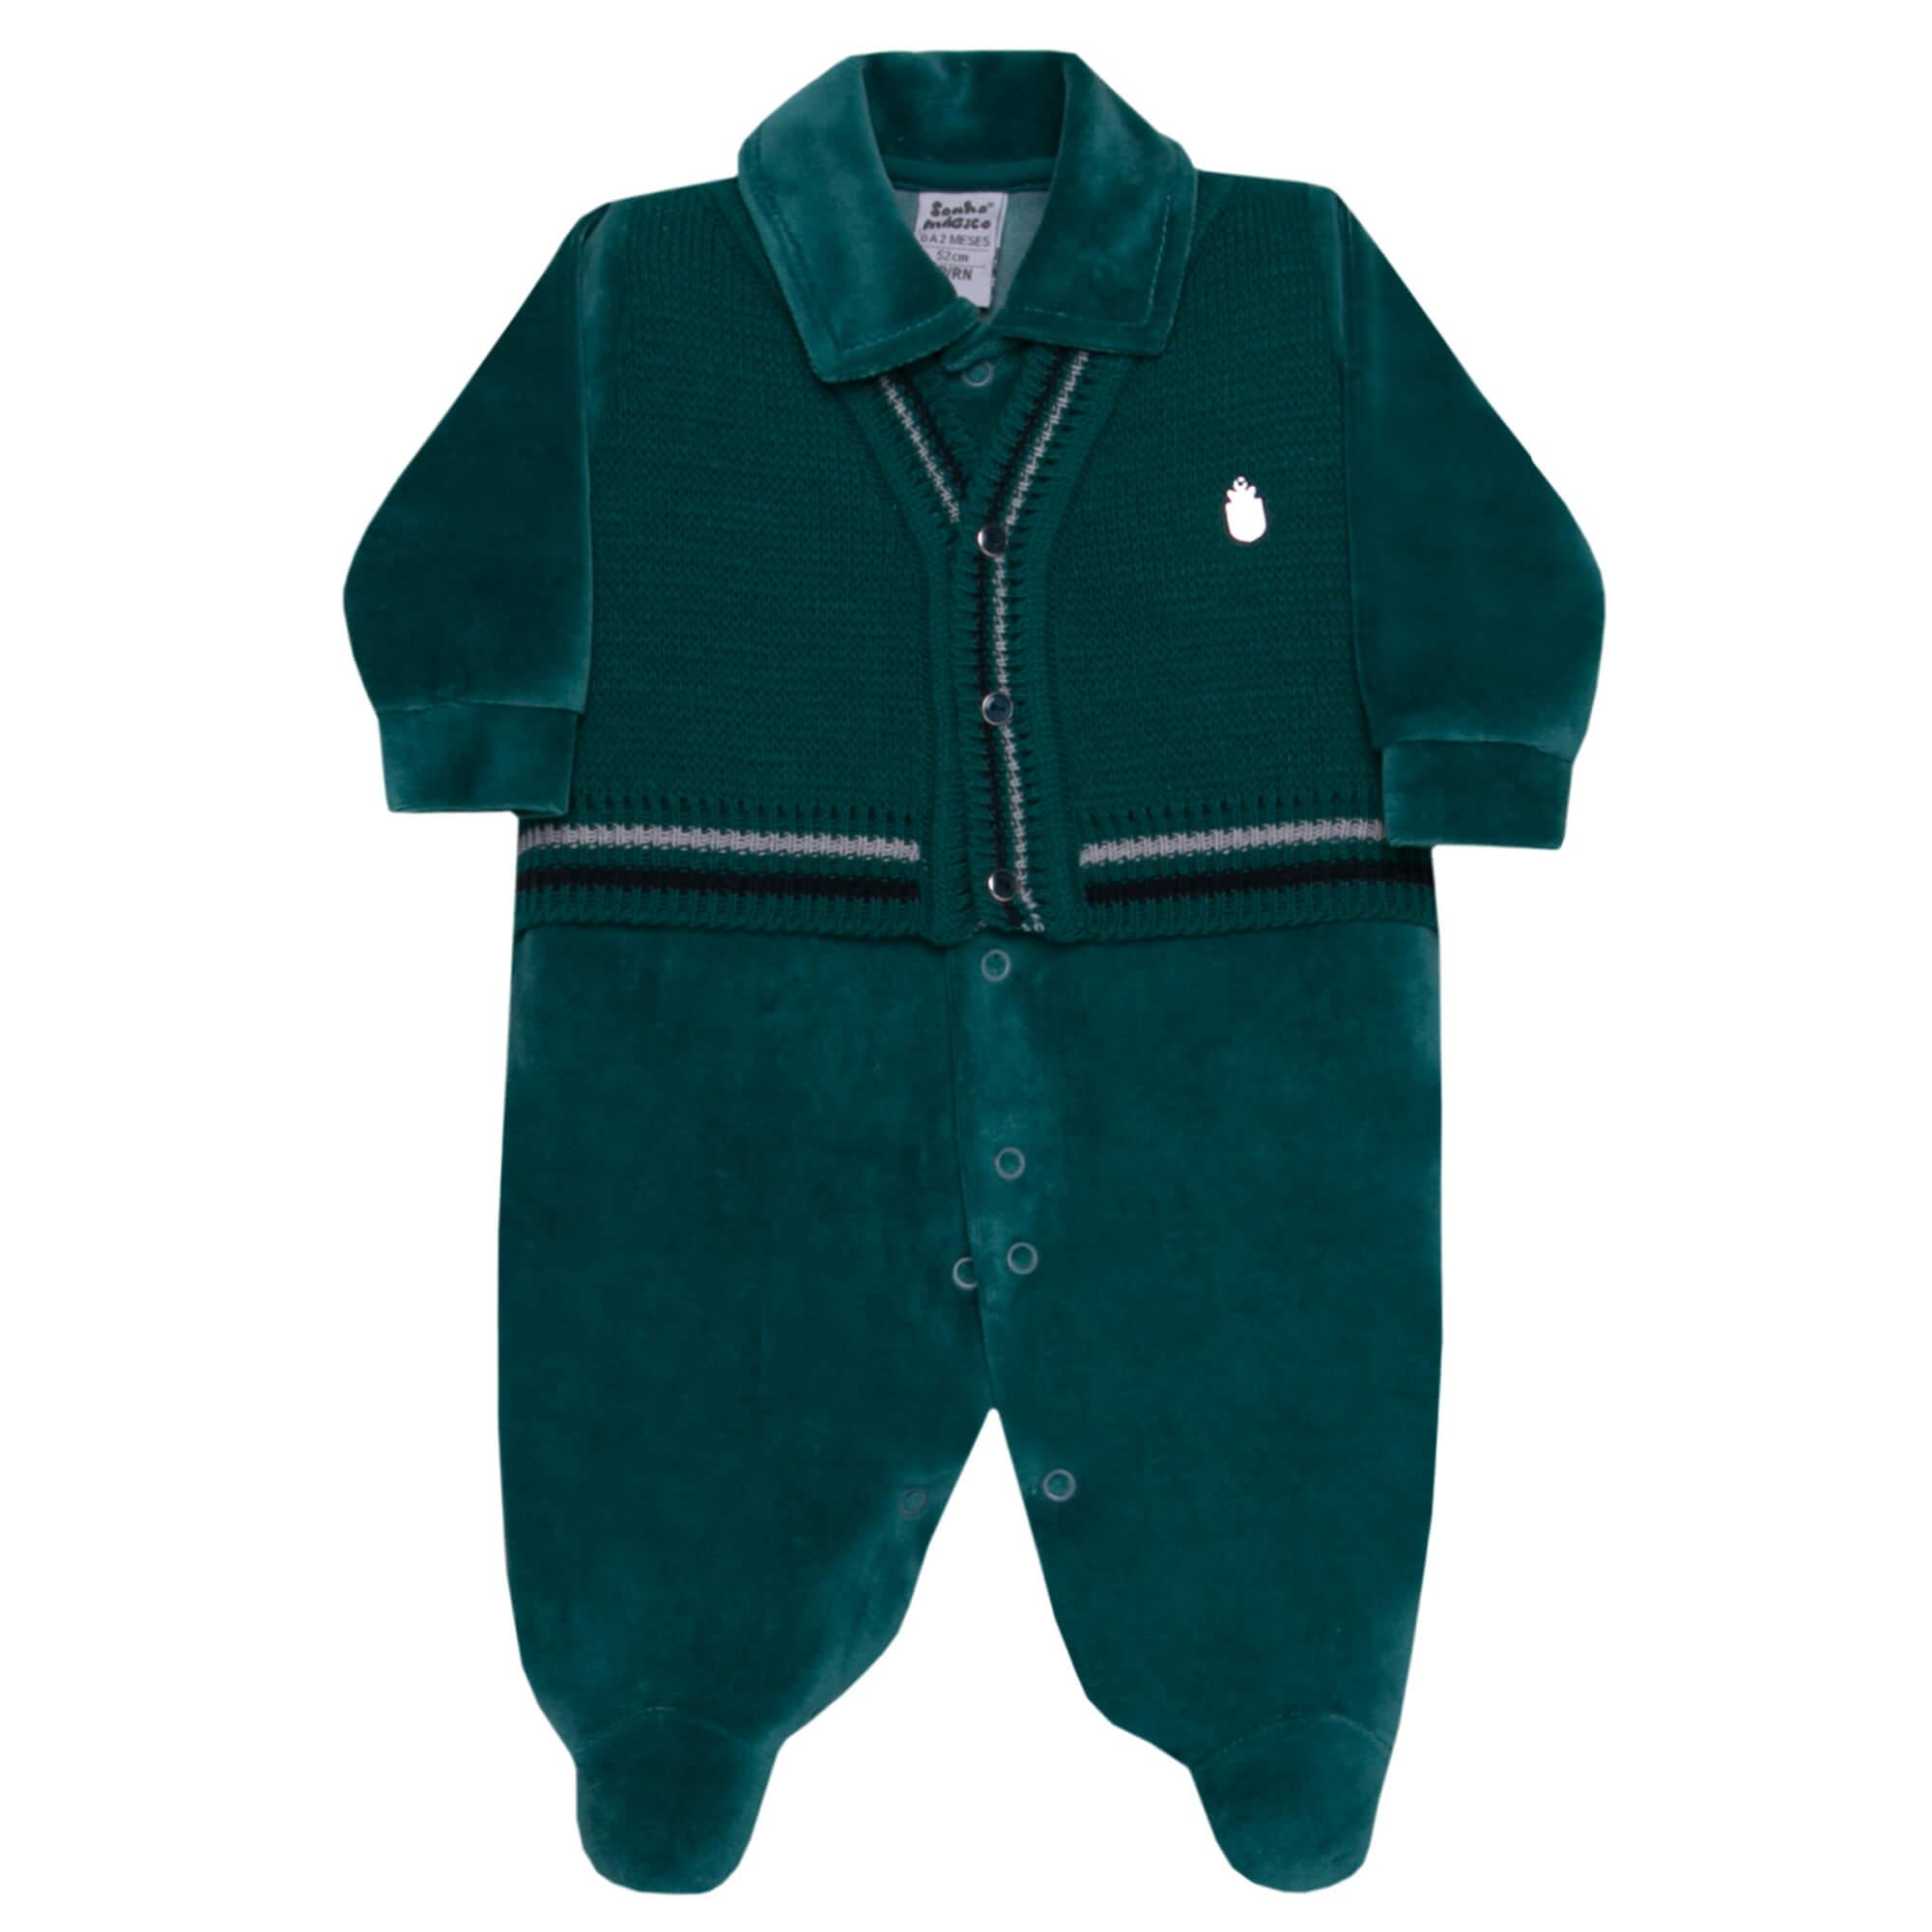 Macacão Inverno Plush Sonho Mágico Knittin Ciclone - PP